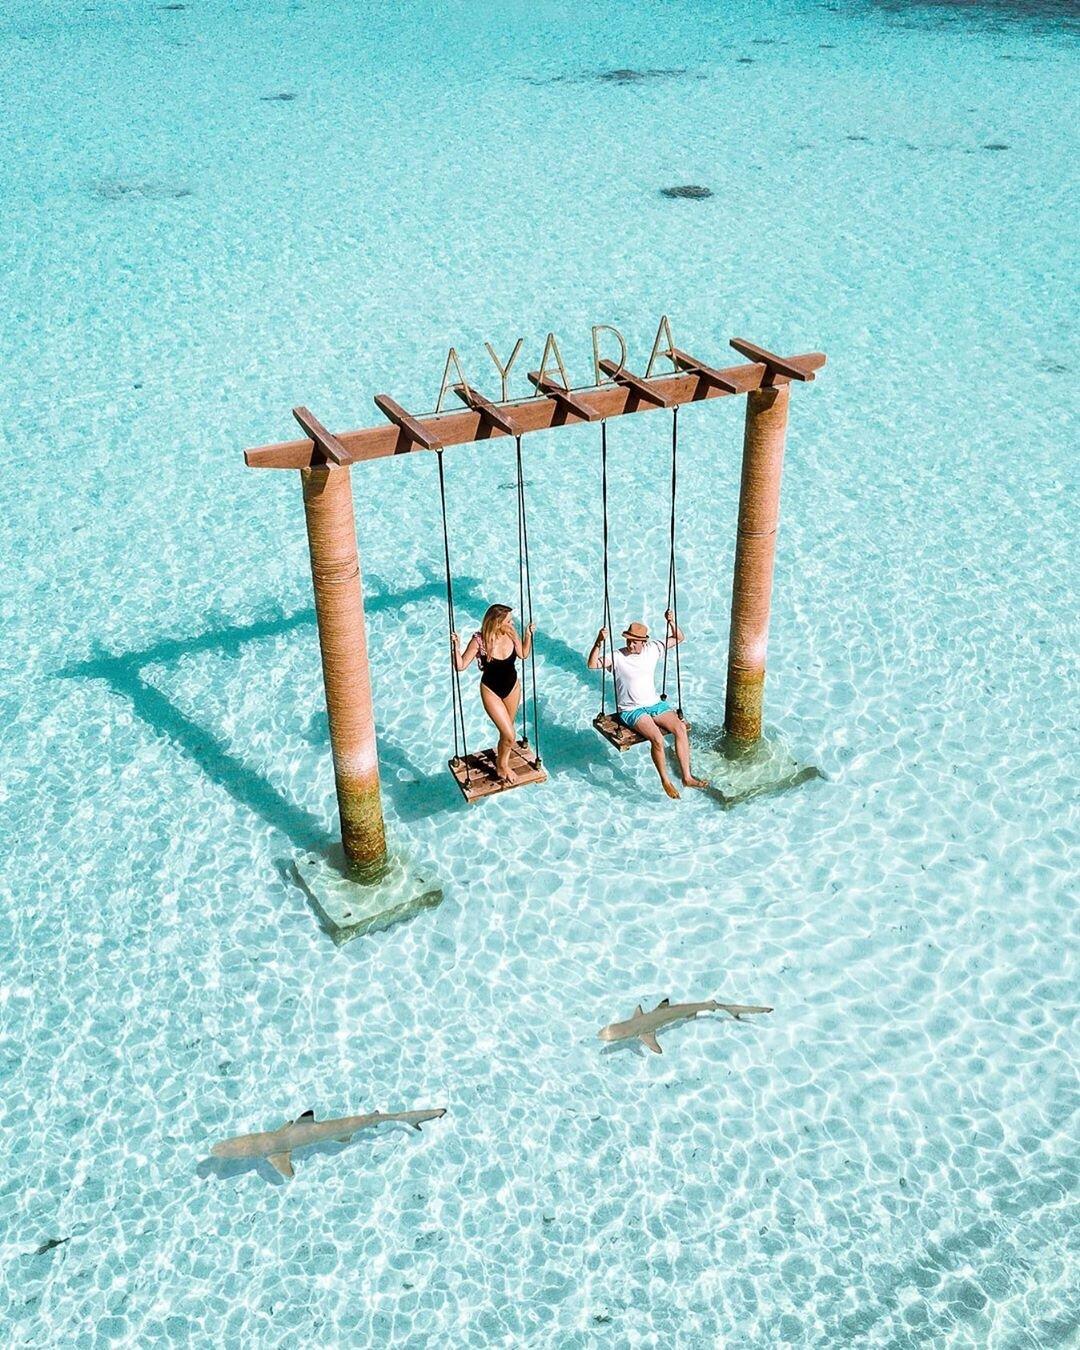 Ayada Maldives - Official Website